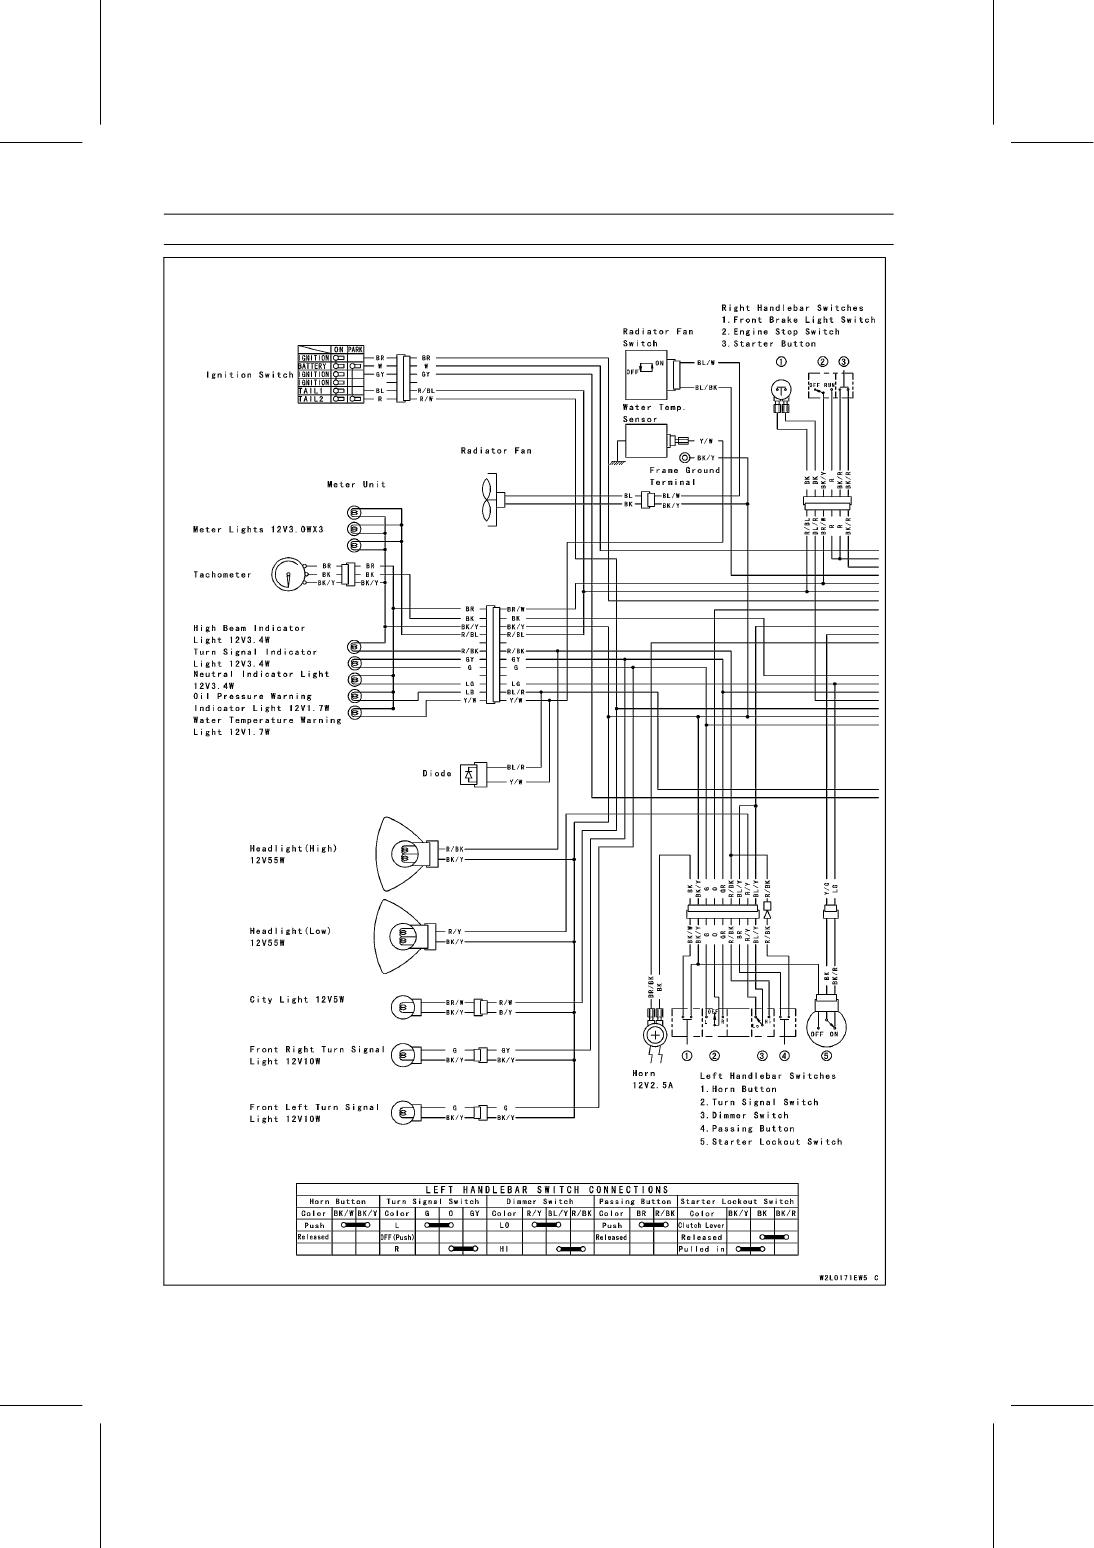 Kawasaki Kle 500 Wiring Diagram 2006 Zx6r Fuse Box Librarybackground Image 16 14 Electrical System Kle500 B1